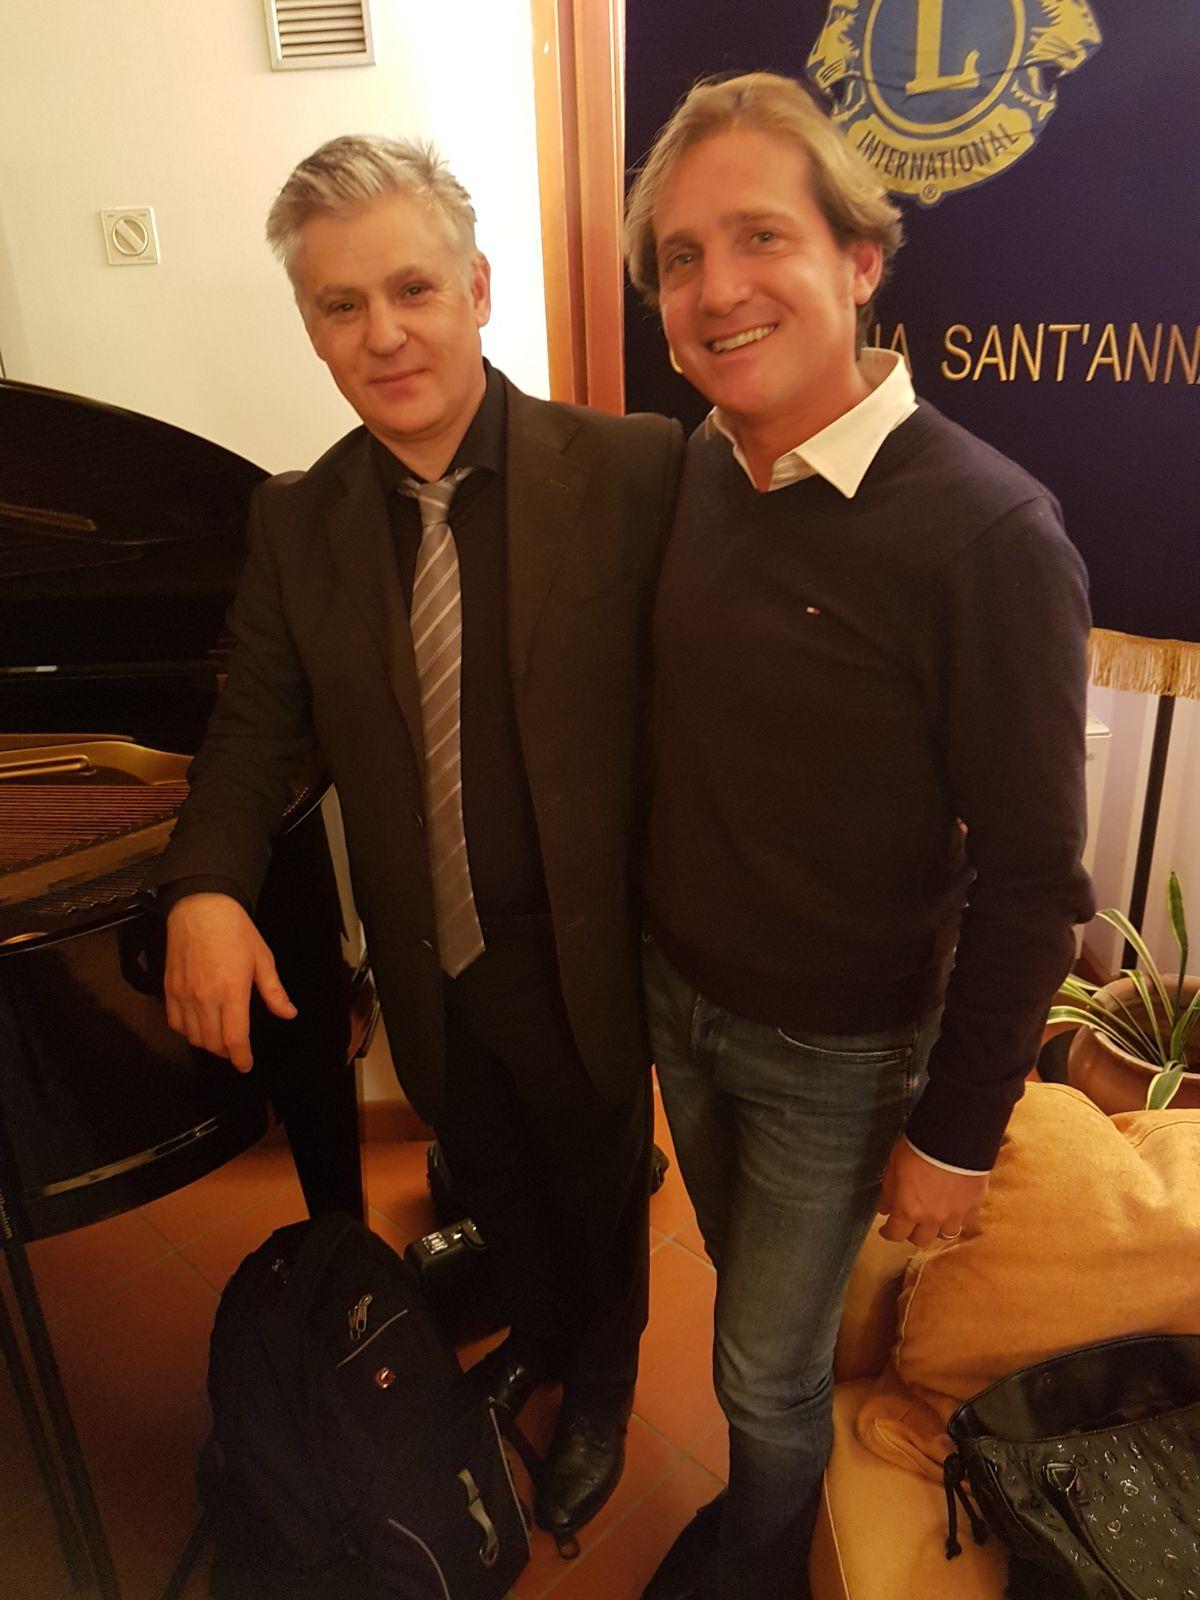 Marco Clerici con Alfredo Ferrario